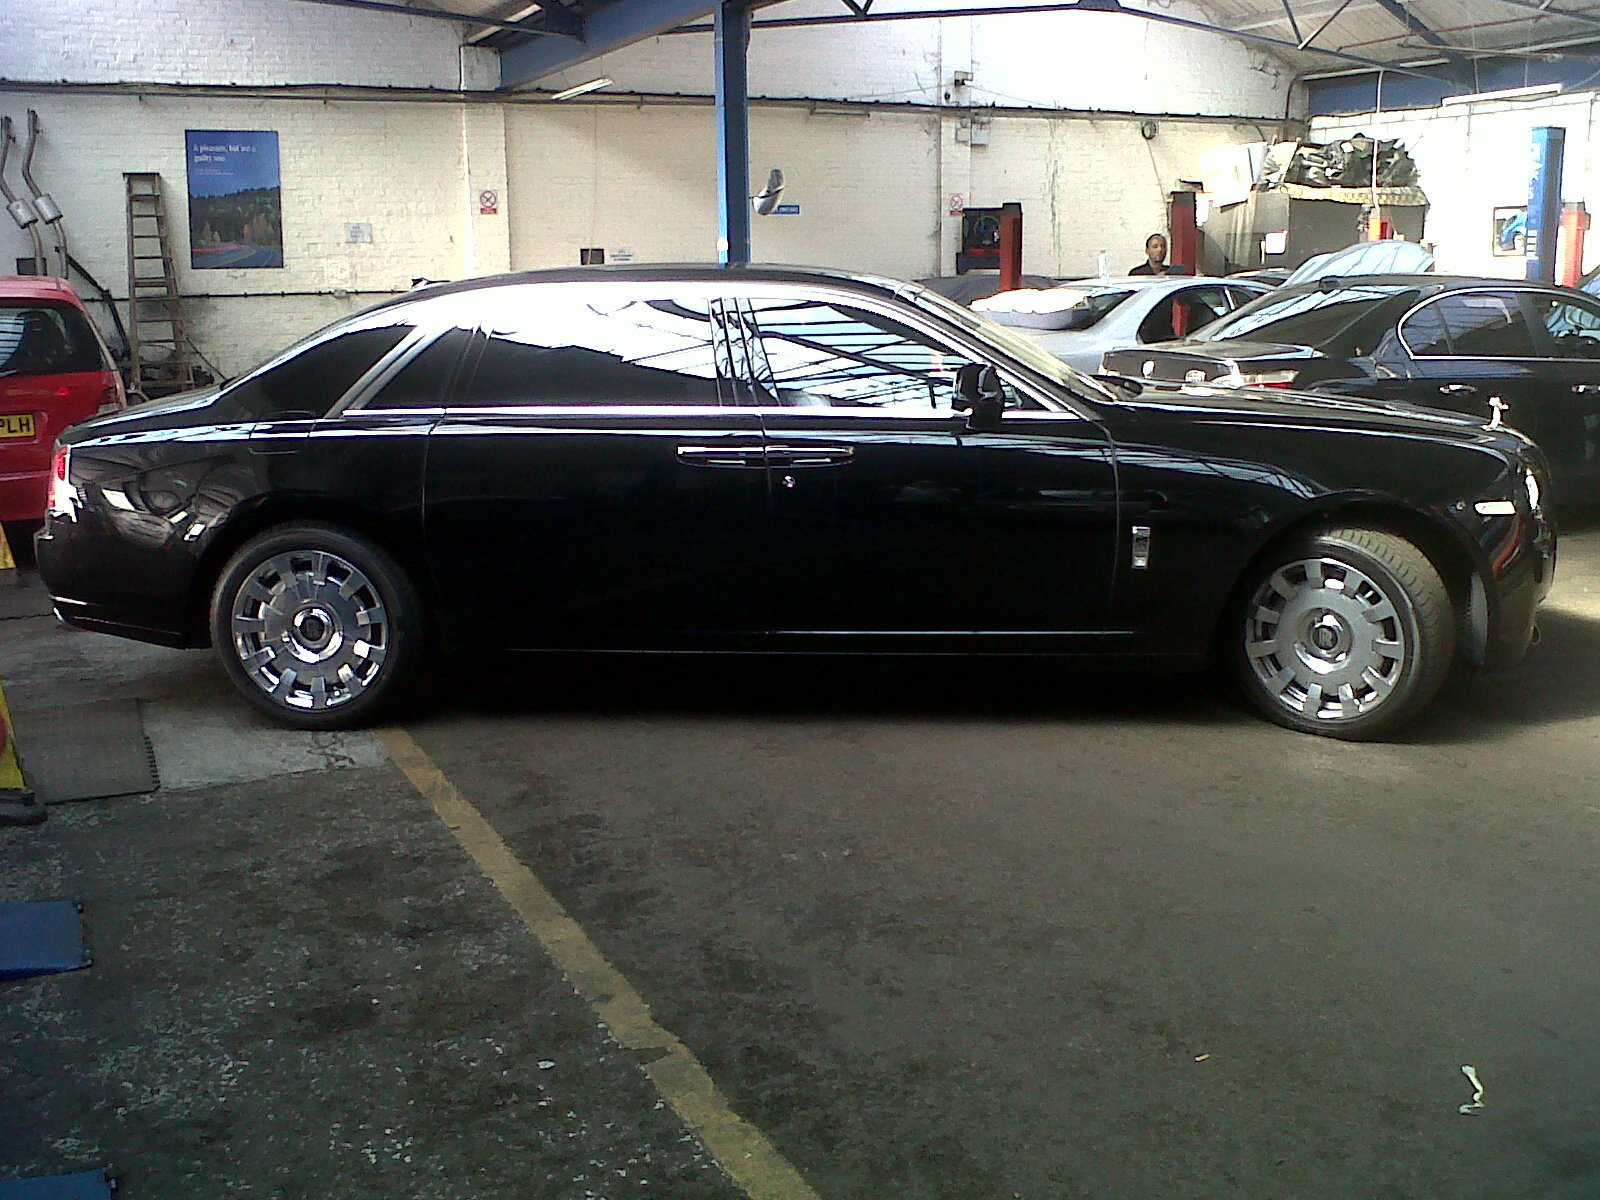 #luxurycar #rollsroyce #carwindowtinting #ladbrokegrove #westlondon